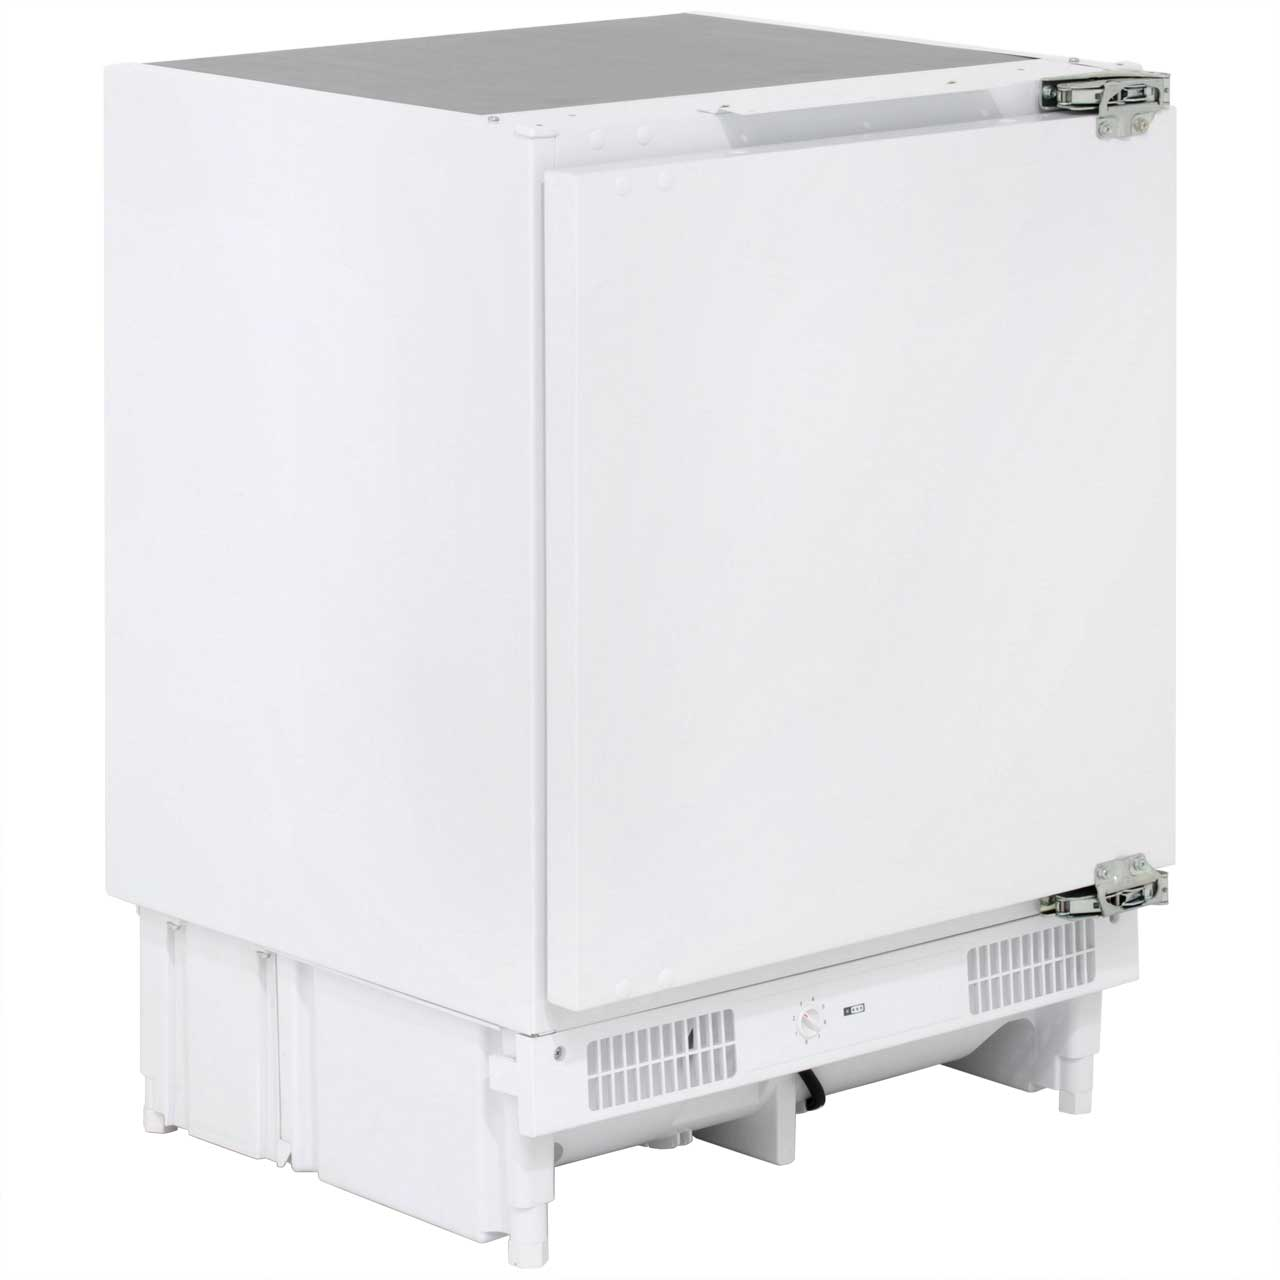 Candy CFU130EK Integrated Under Counter Freezer review